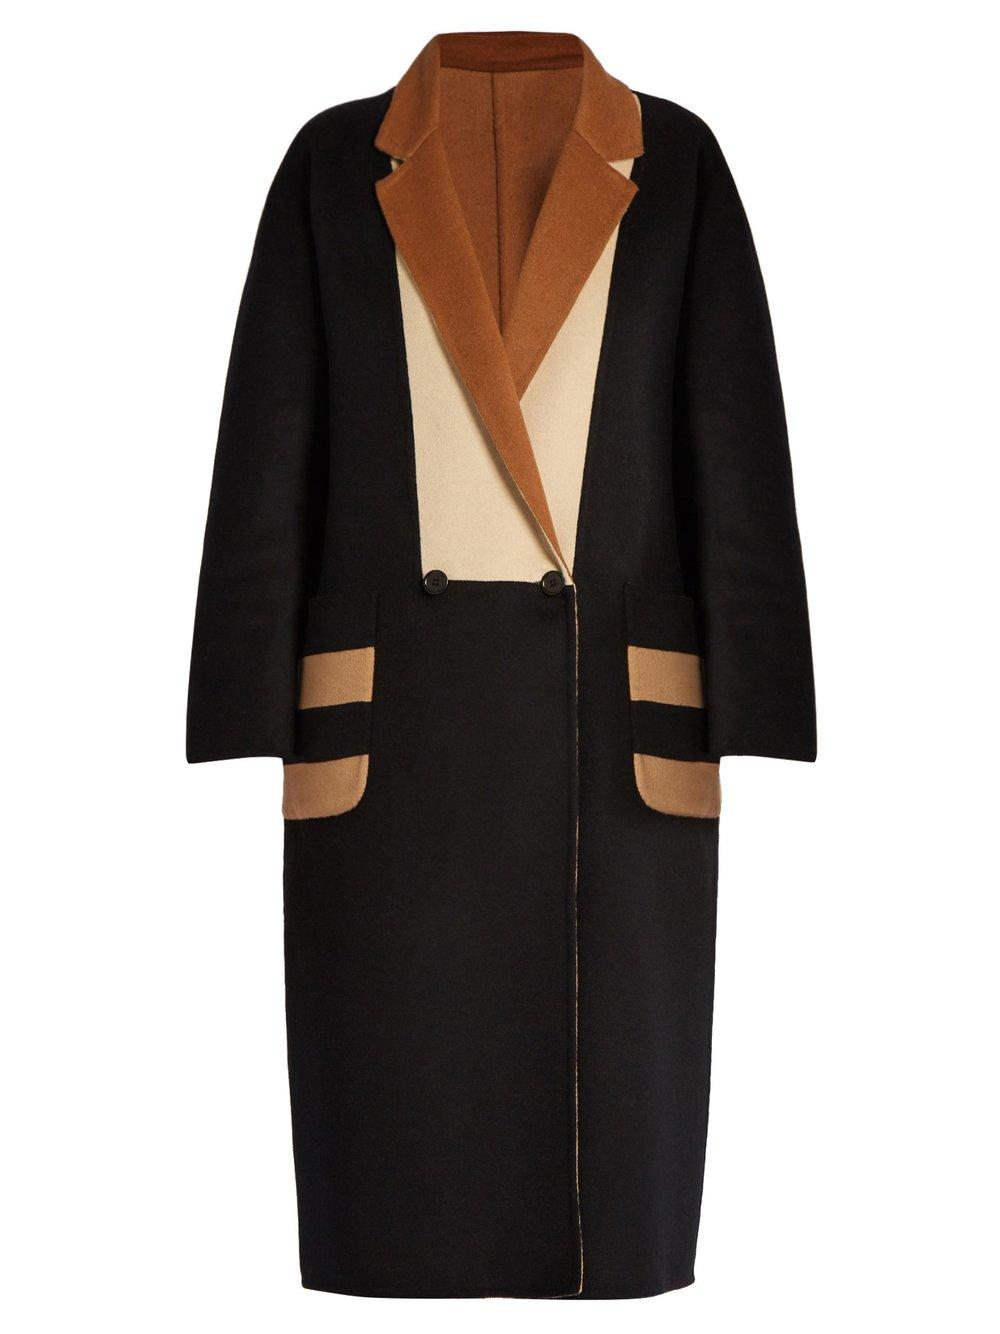 Max Mara Kipur coat $3,905